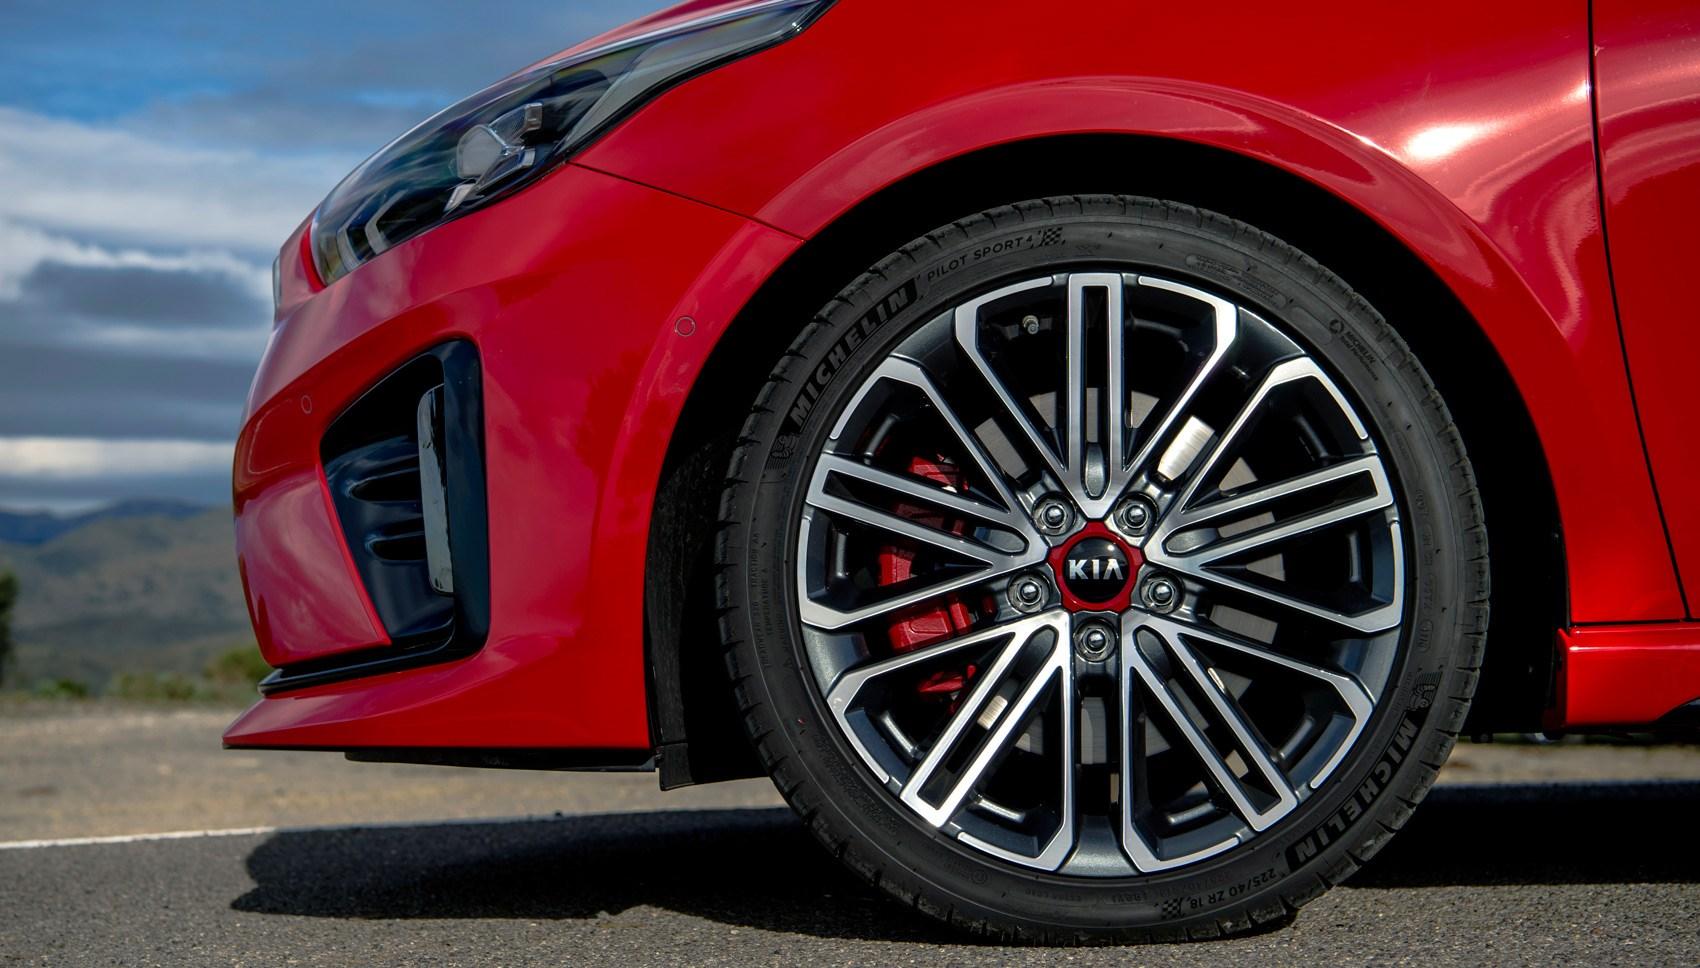 Ceed GT wheel